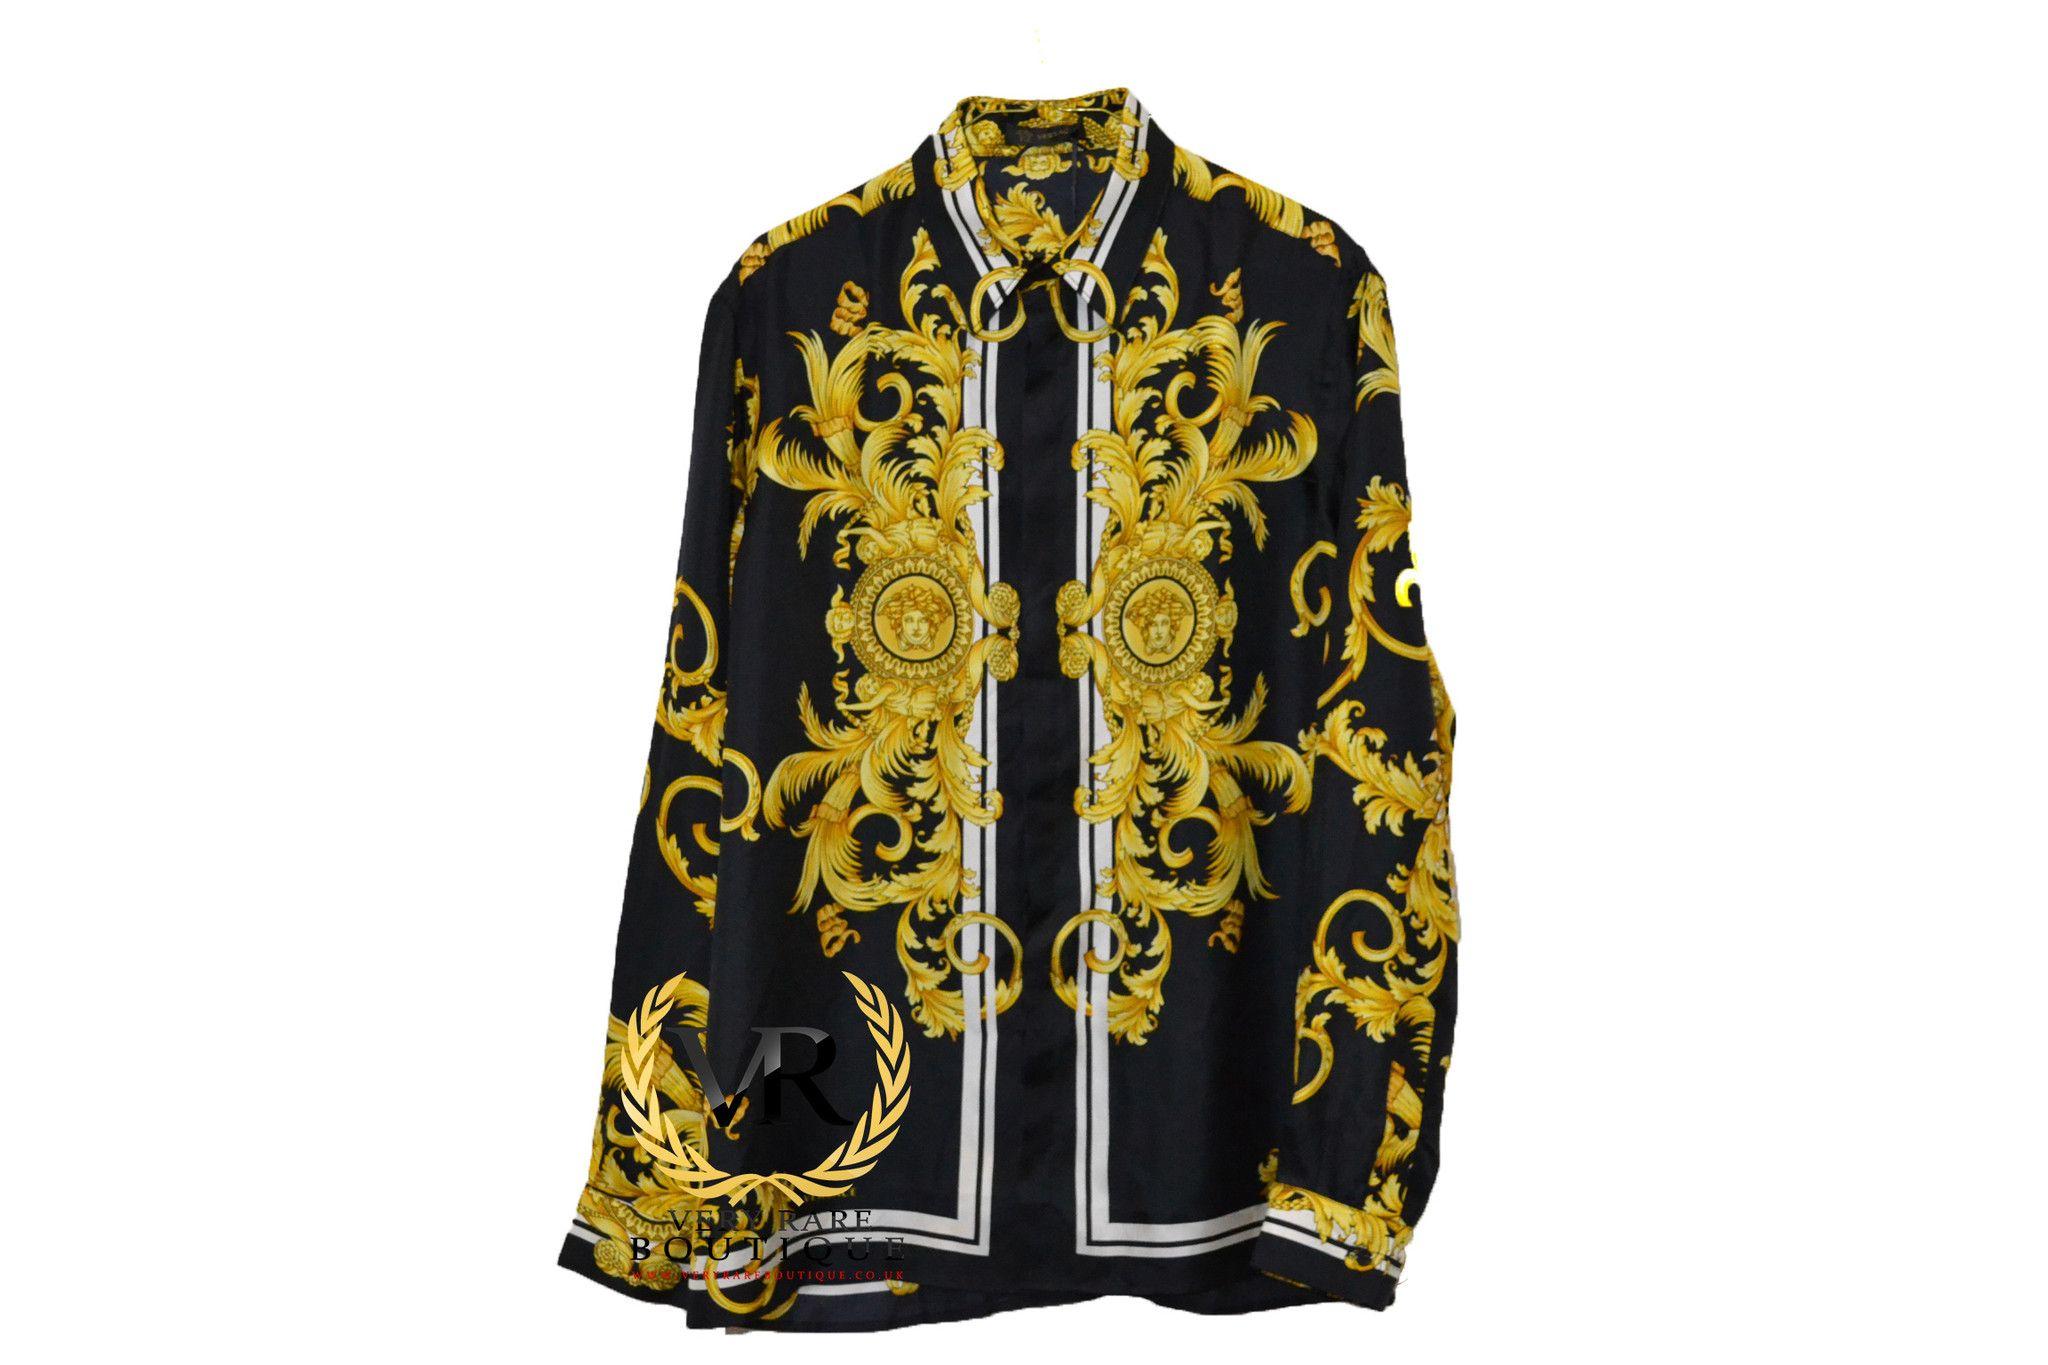 VERSACE, BAROQUE BUTTON-UP SHIRT (Black)   Streetwear and High ... 66e0e536b88